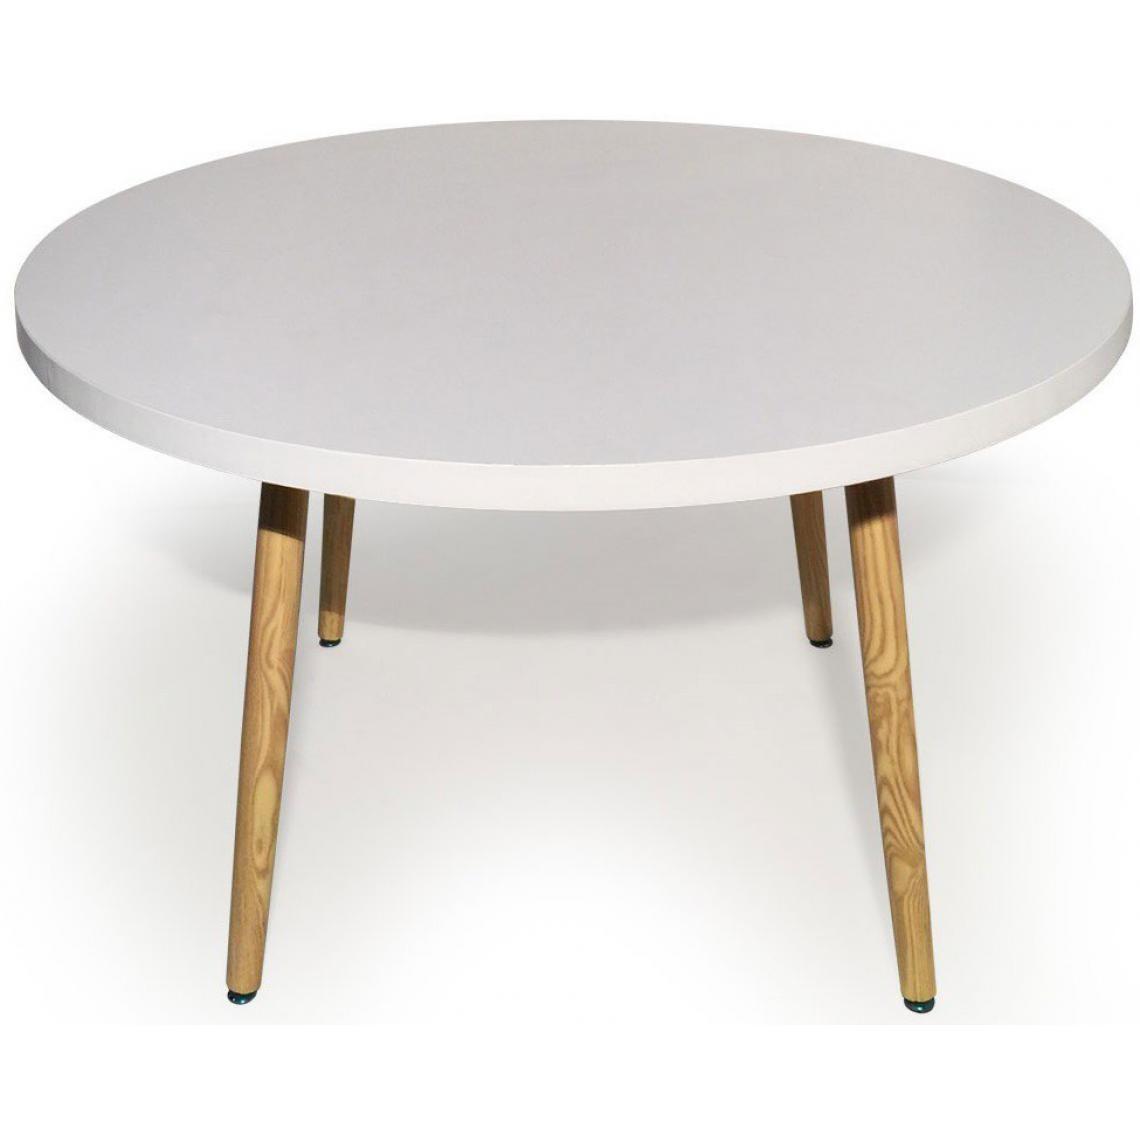 table ronde style scandinave blanc blondie